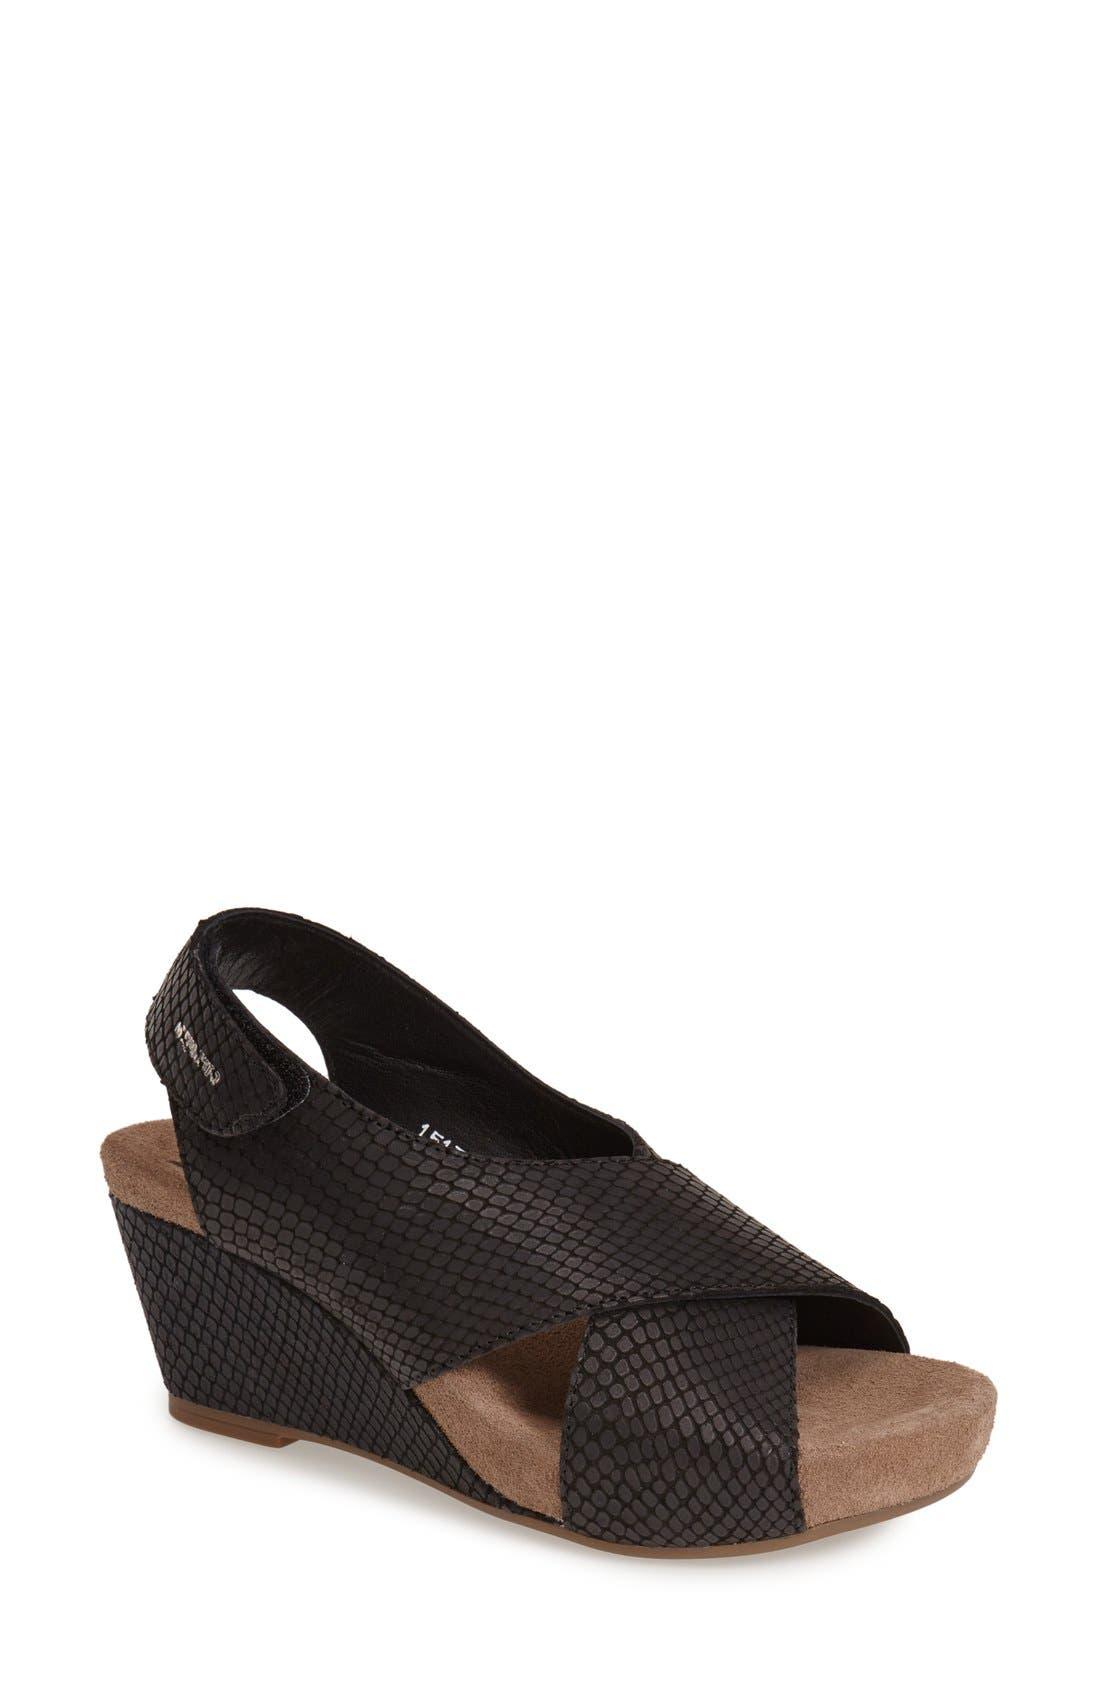 Alternate Image 1 Selected - Mephisto 'Belina' Slingback Wedge Sandal (Women)